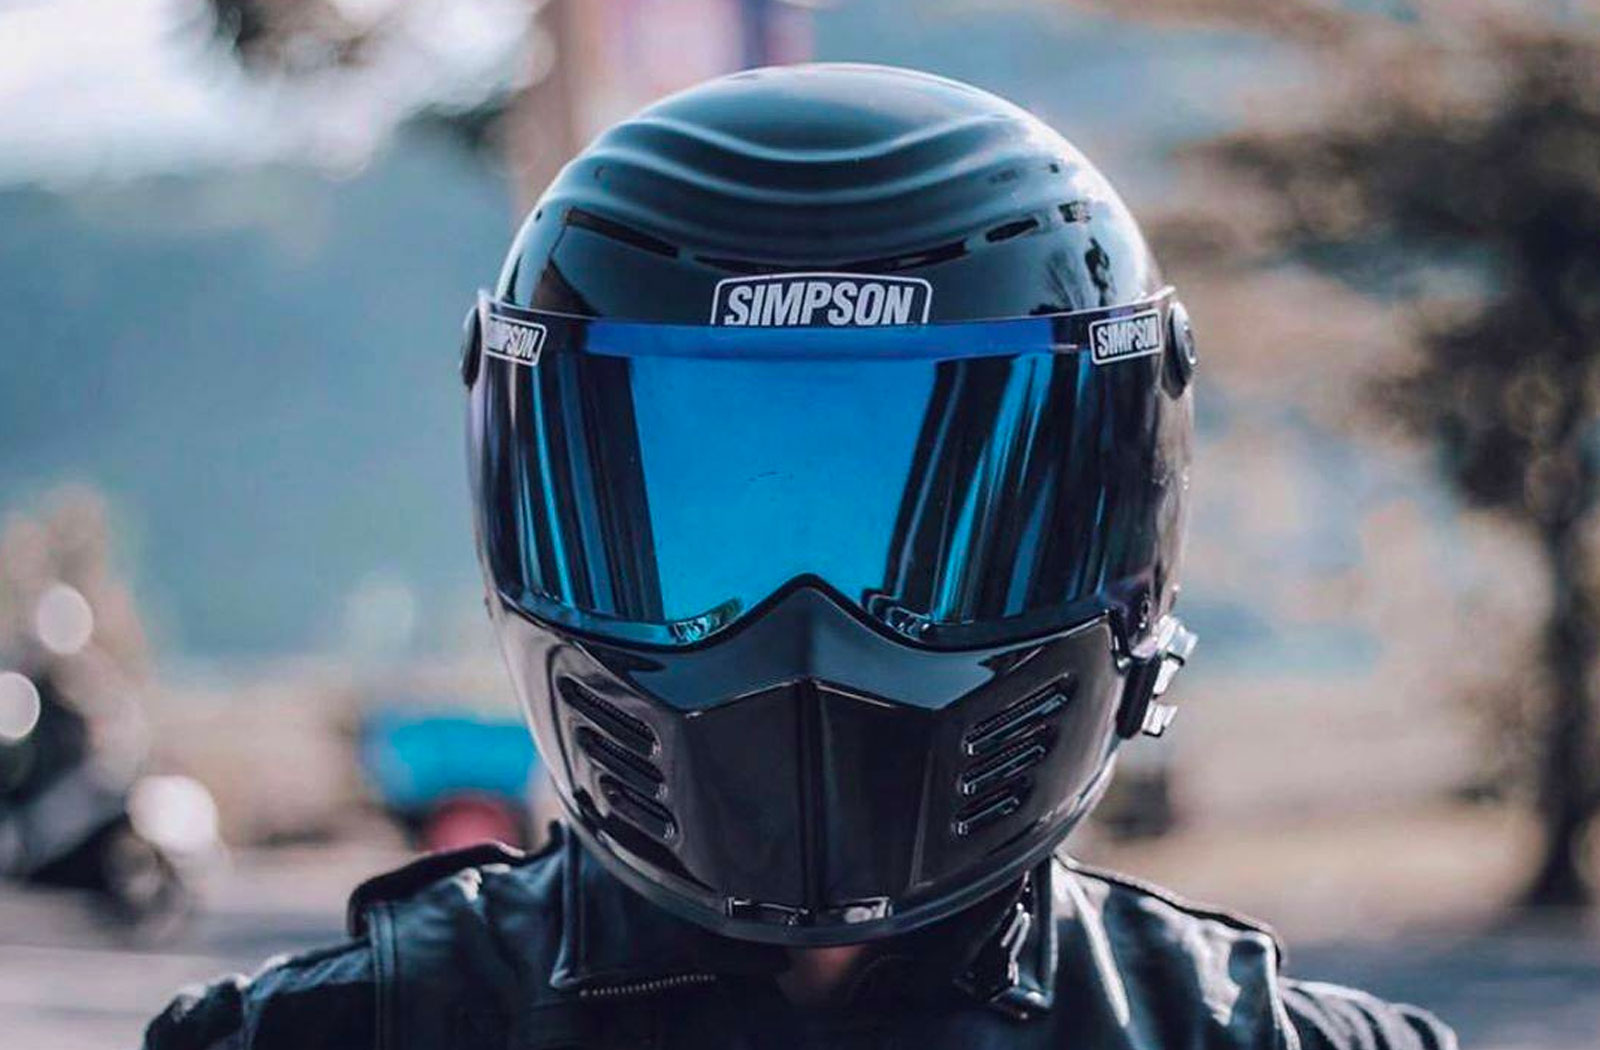 Simpson Outlaw Bandit Helmet